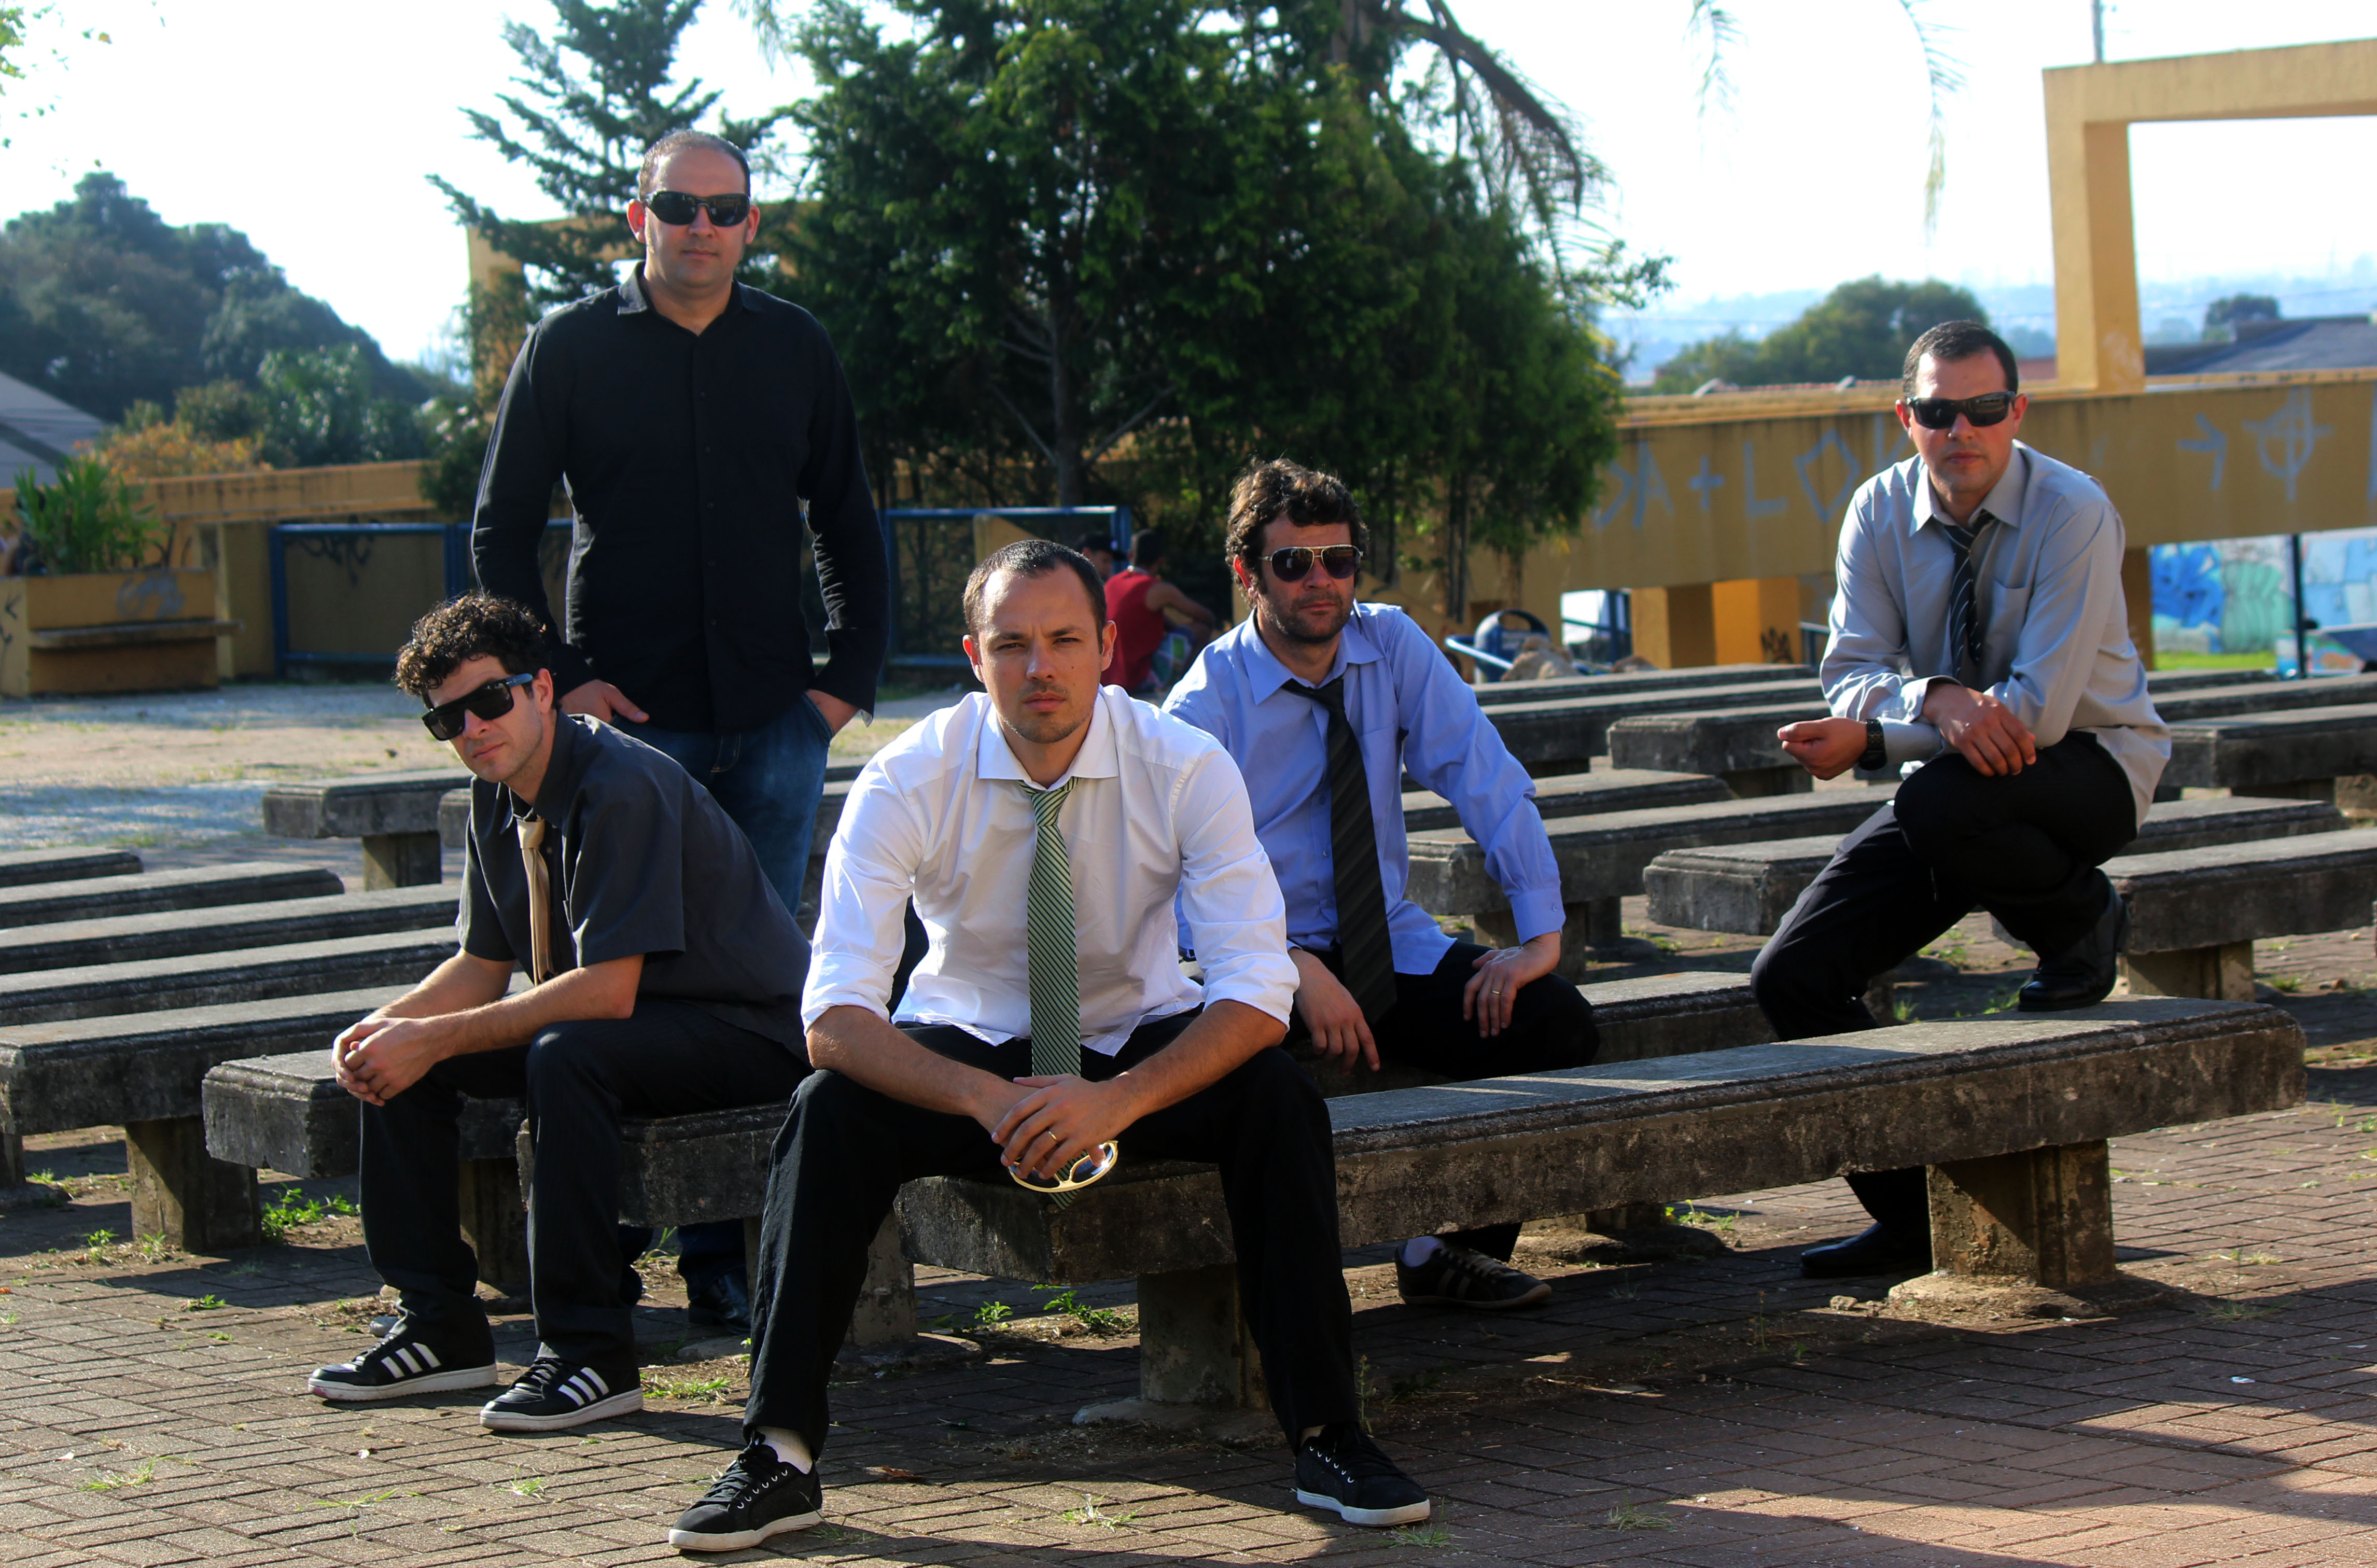 Banda Sol de Novembro se apresenta no próximo sábado no SESI